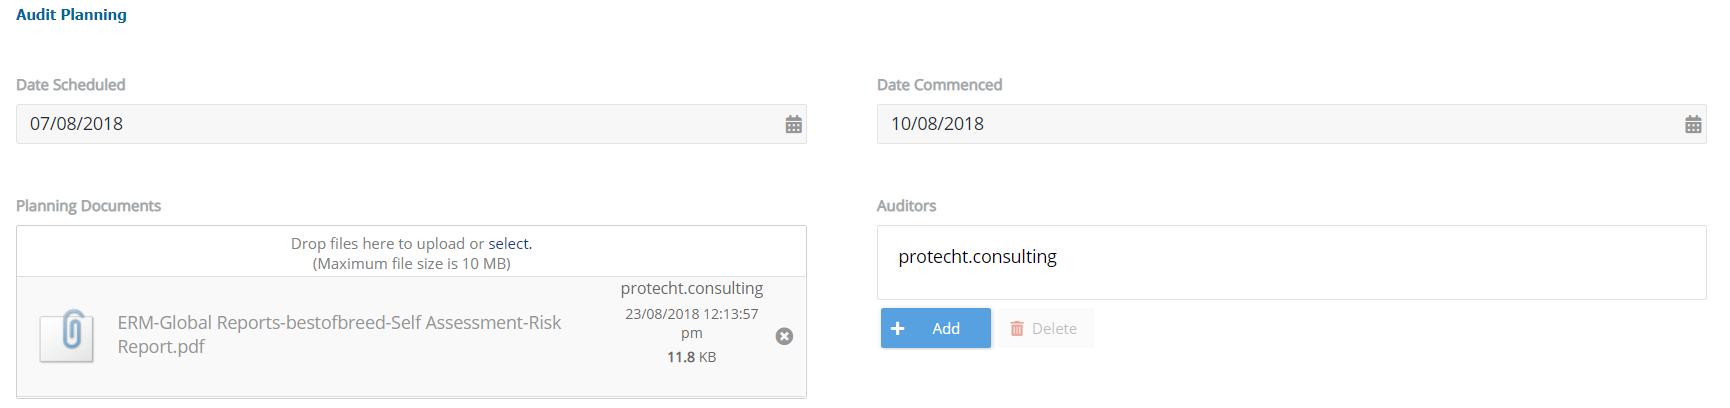 5. Audit Planning